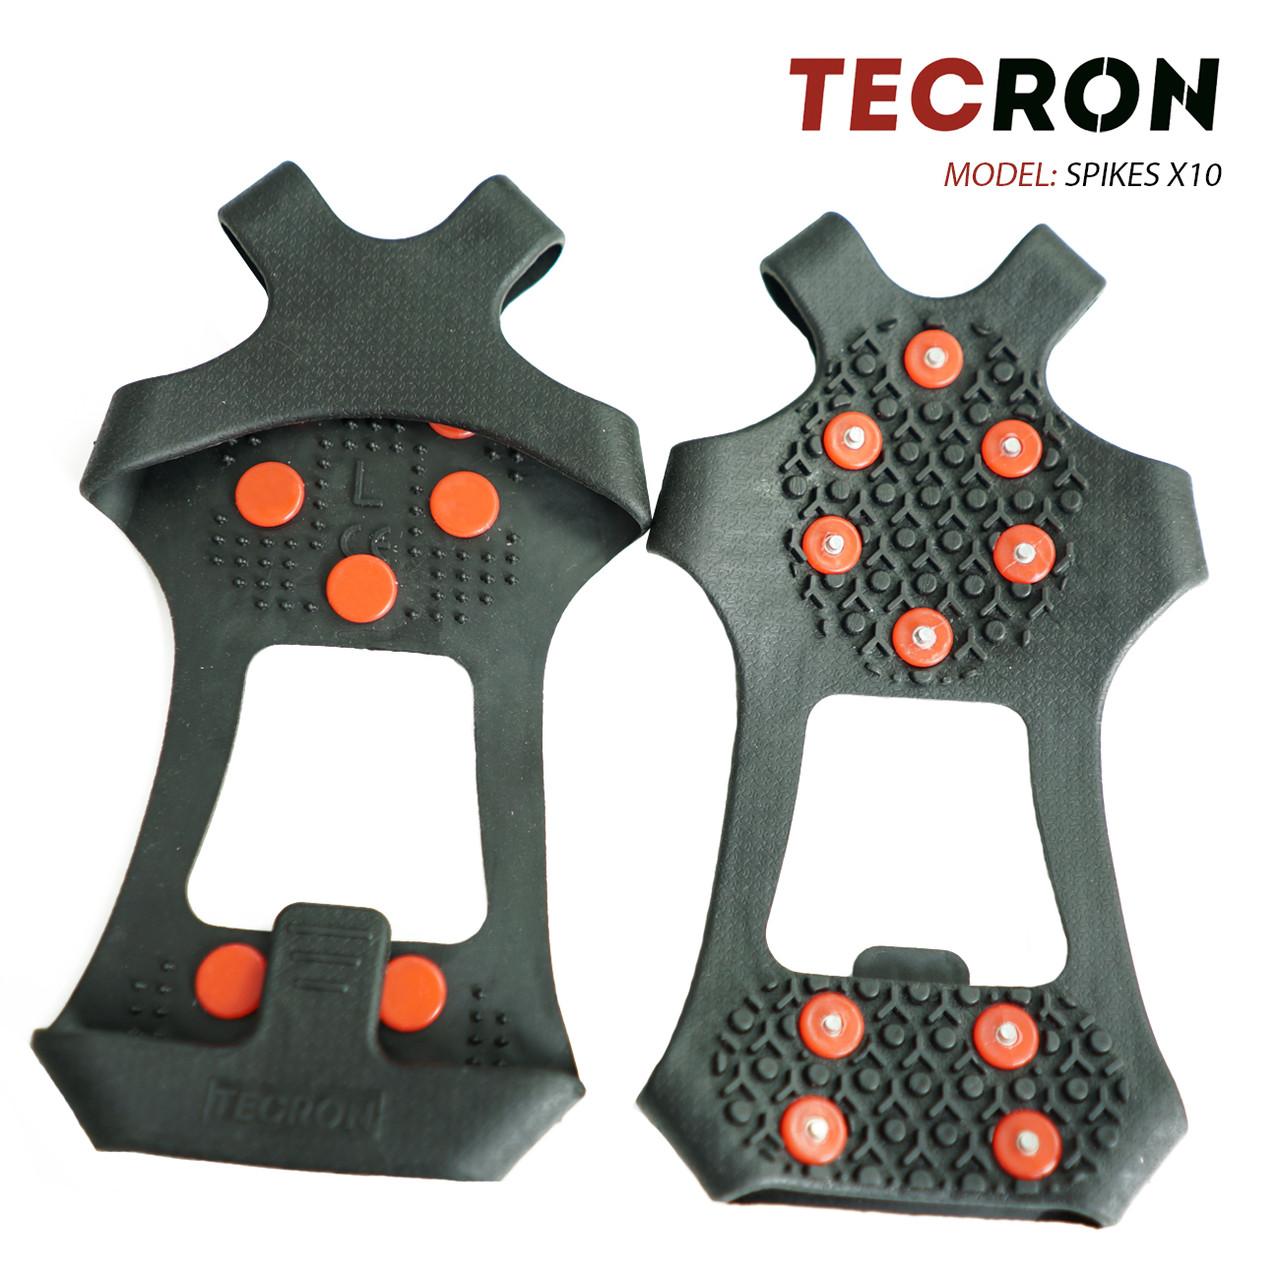 Ледоступы (ледоходы) TECRON™ Spikes X10